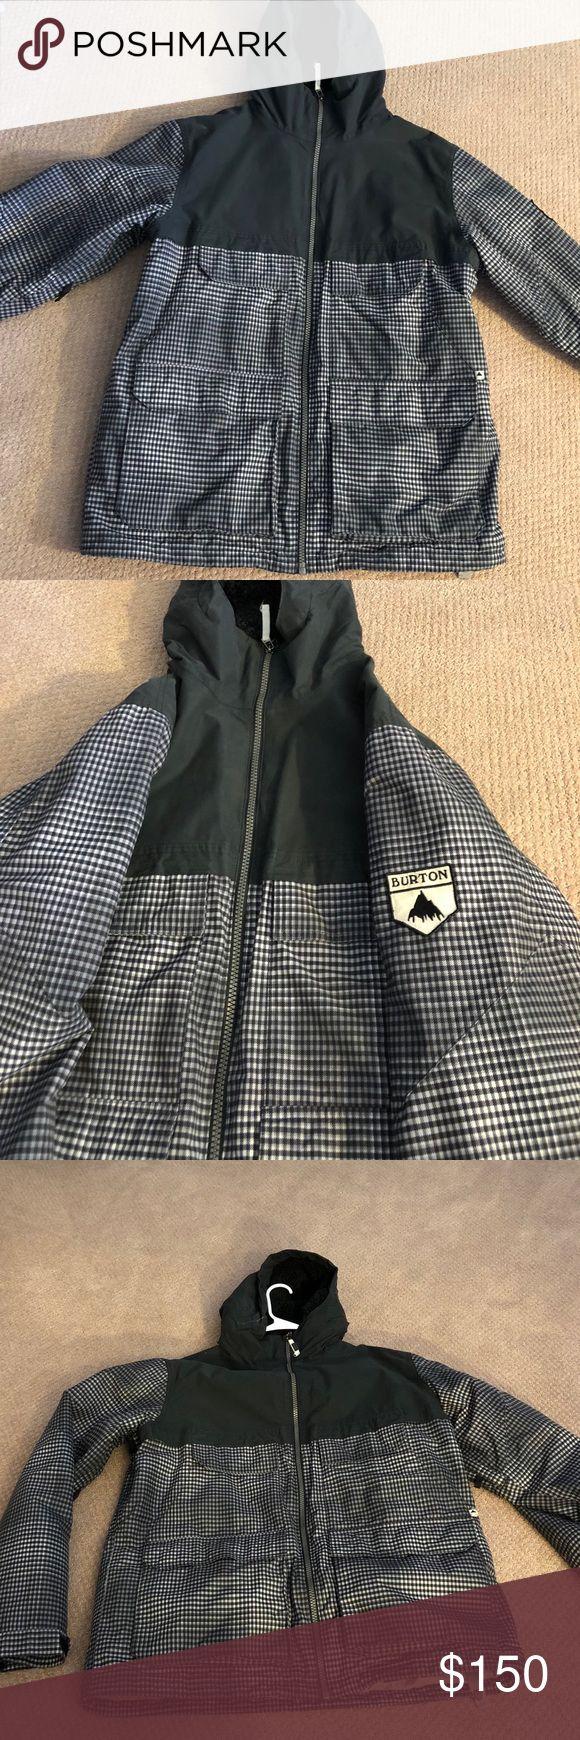 Burton Jacket 🏂⛷ Well kept Burton jacket size XL. Great for cold weather sports! Burton Jackets & Coats Ski & Snowboard